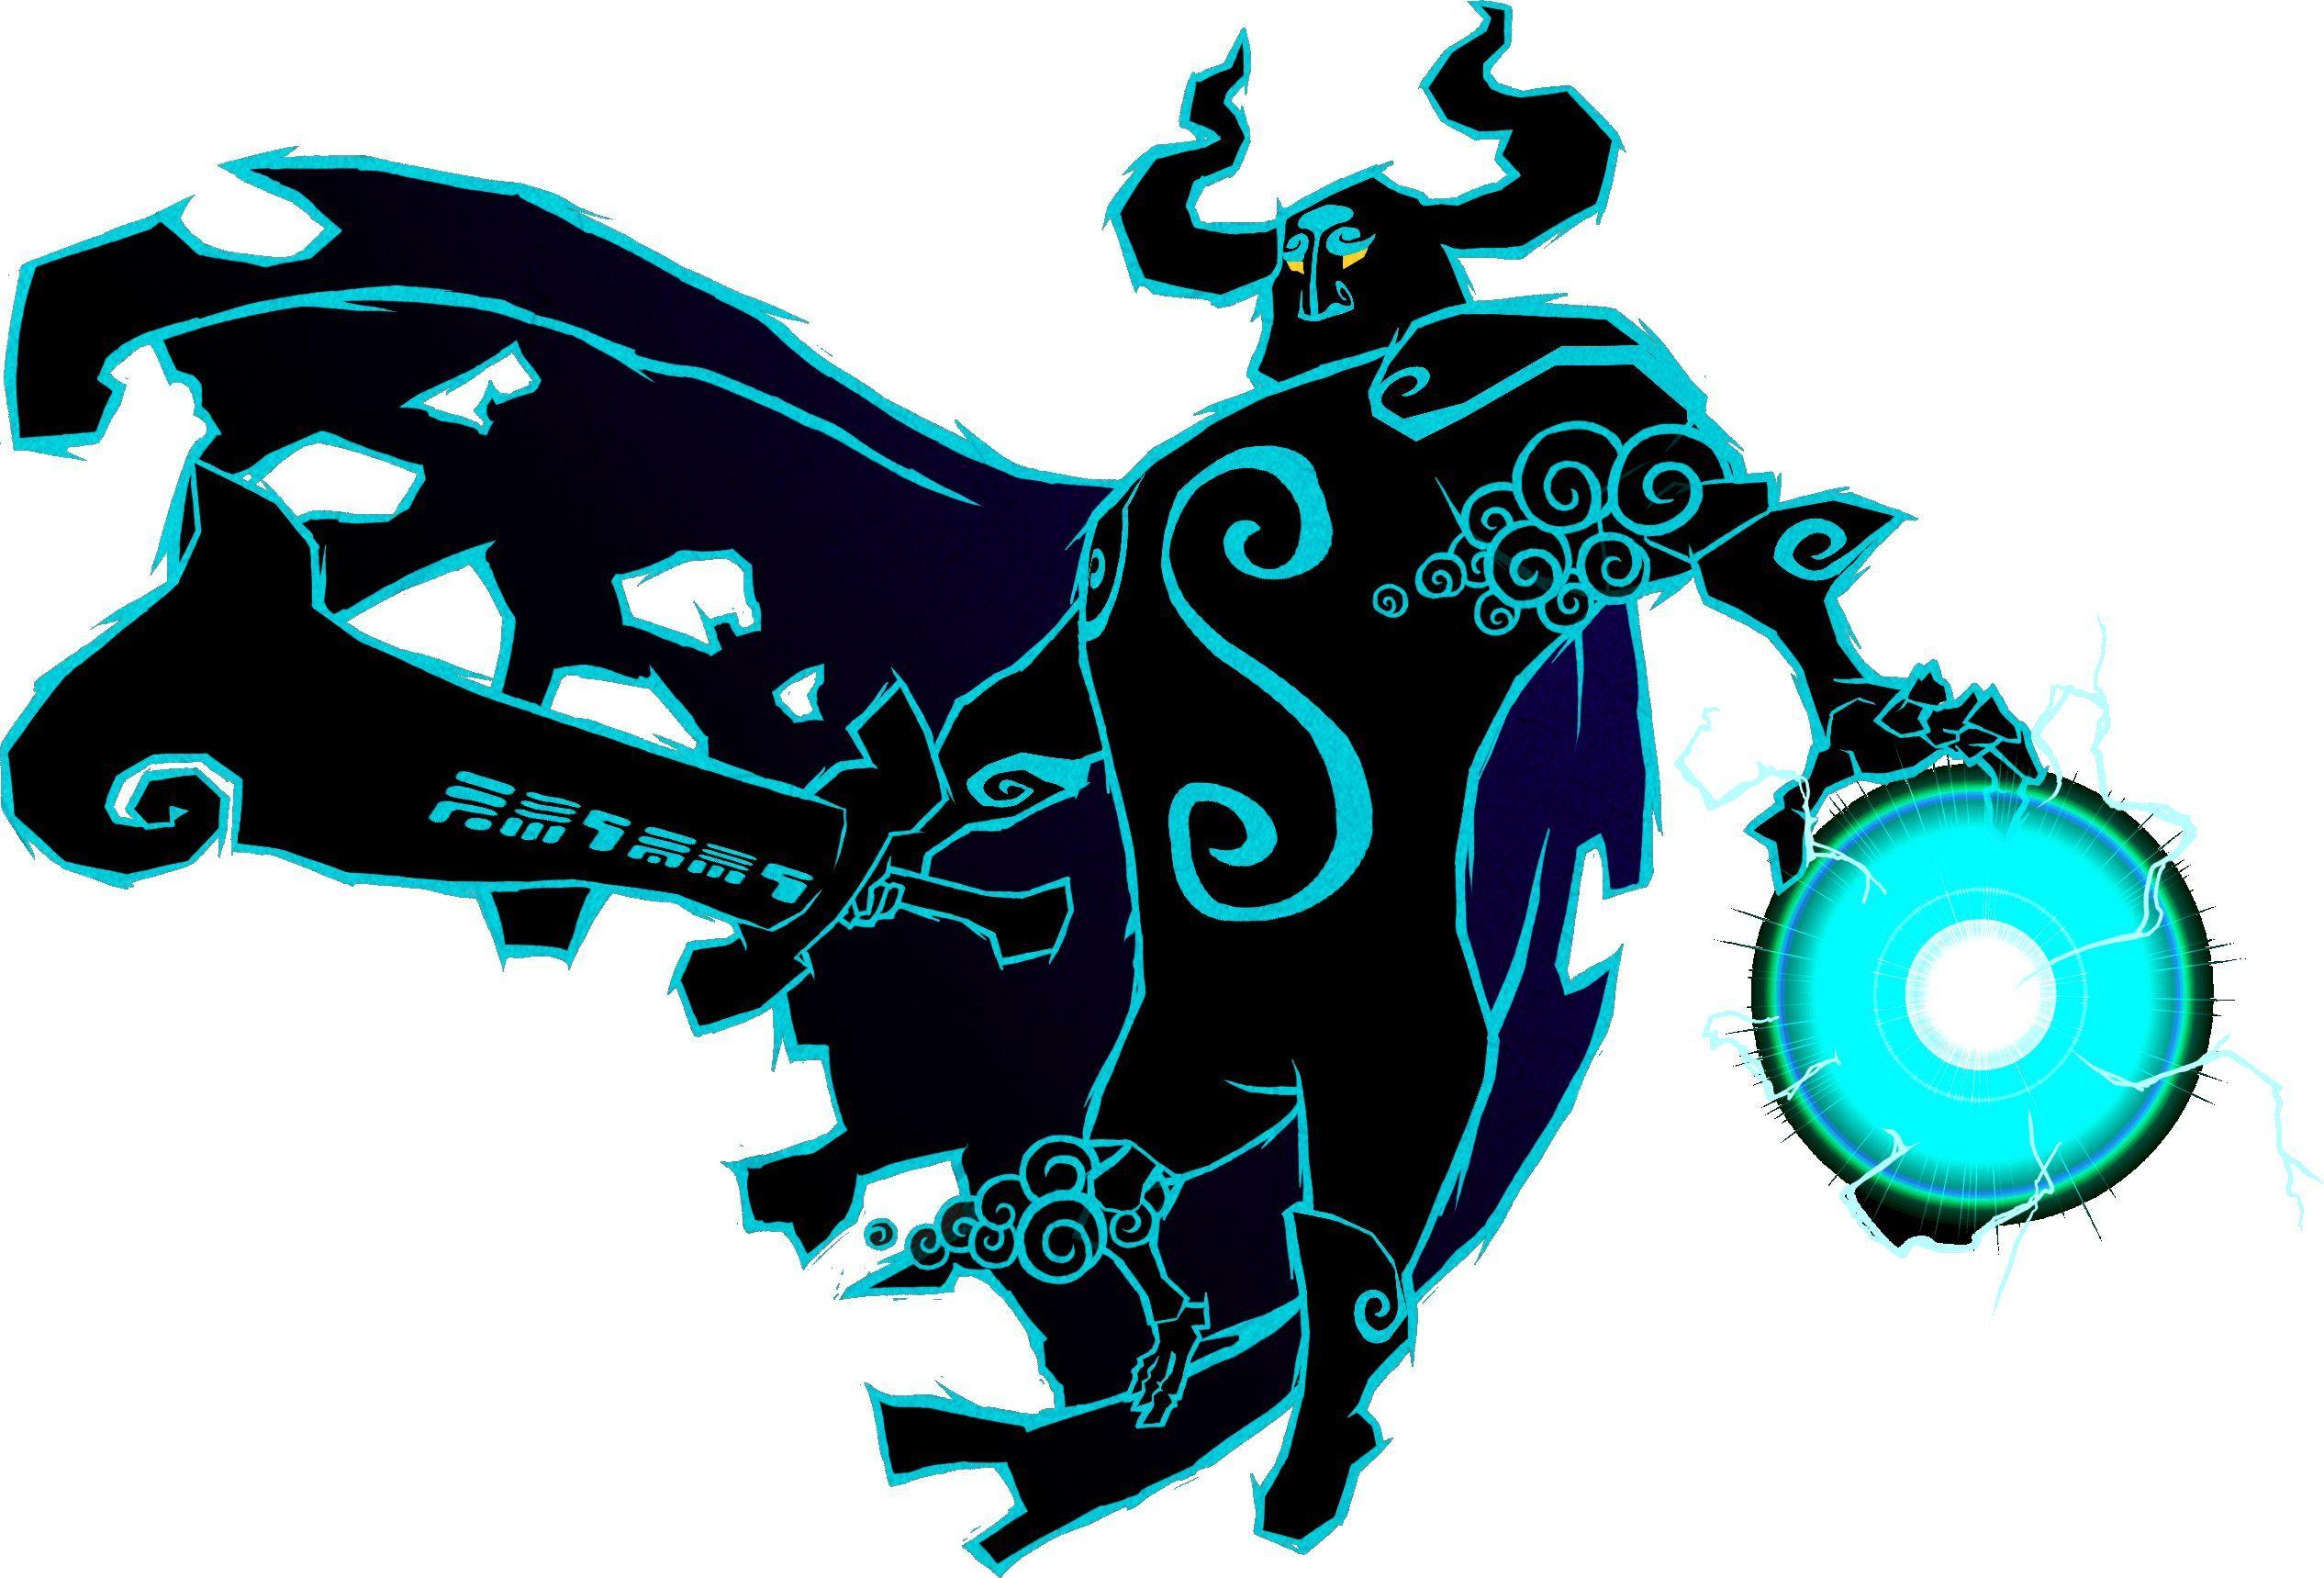 BONUS: WW: ¿Qué pone en la espada del Ganon fantasma?